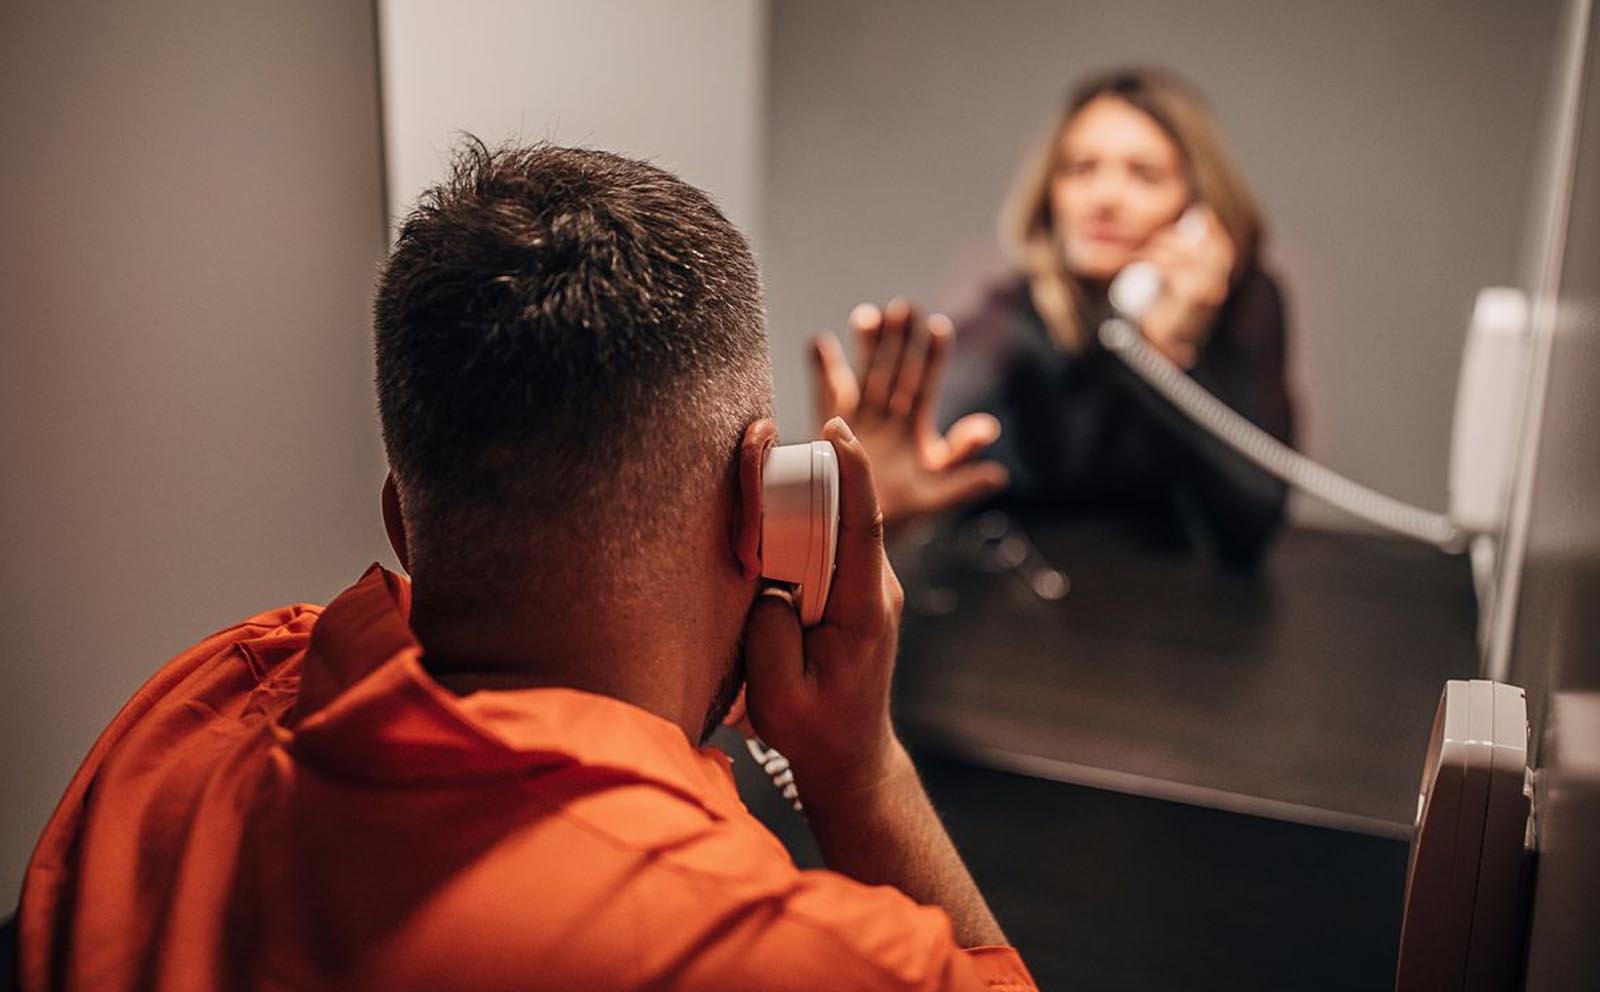 Talking to inmate